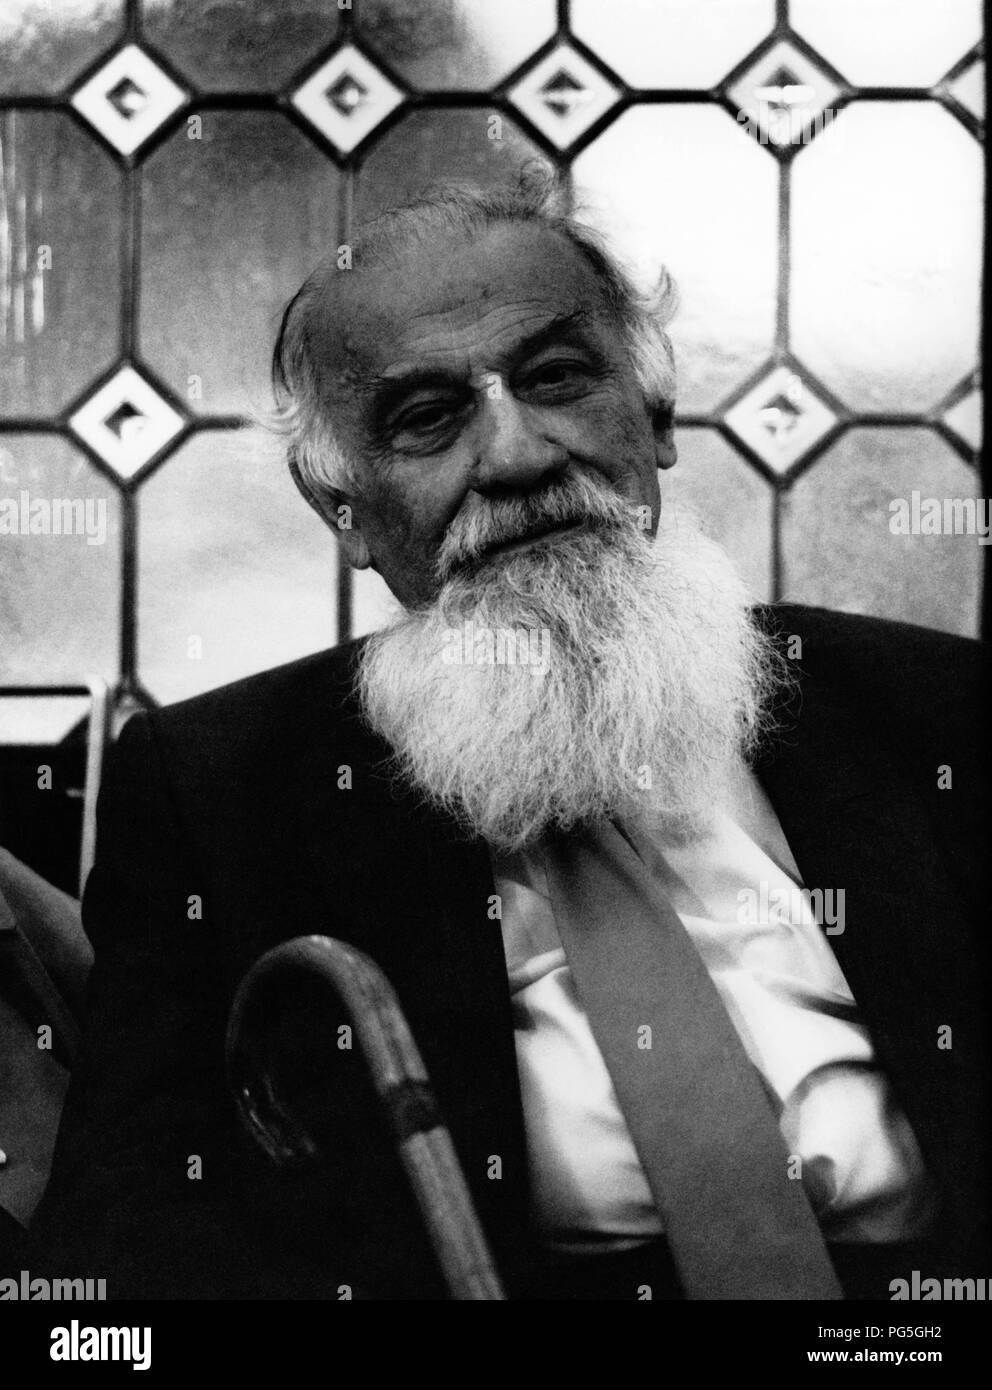 Lev Oshanin: biography of an outstanding writer